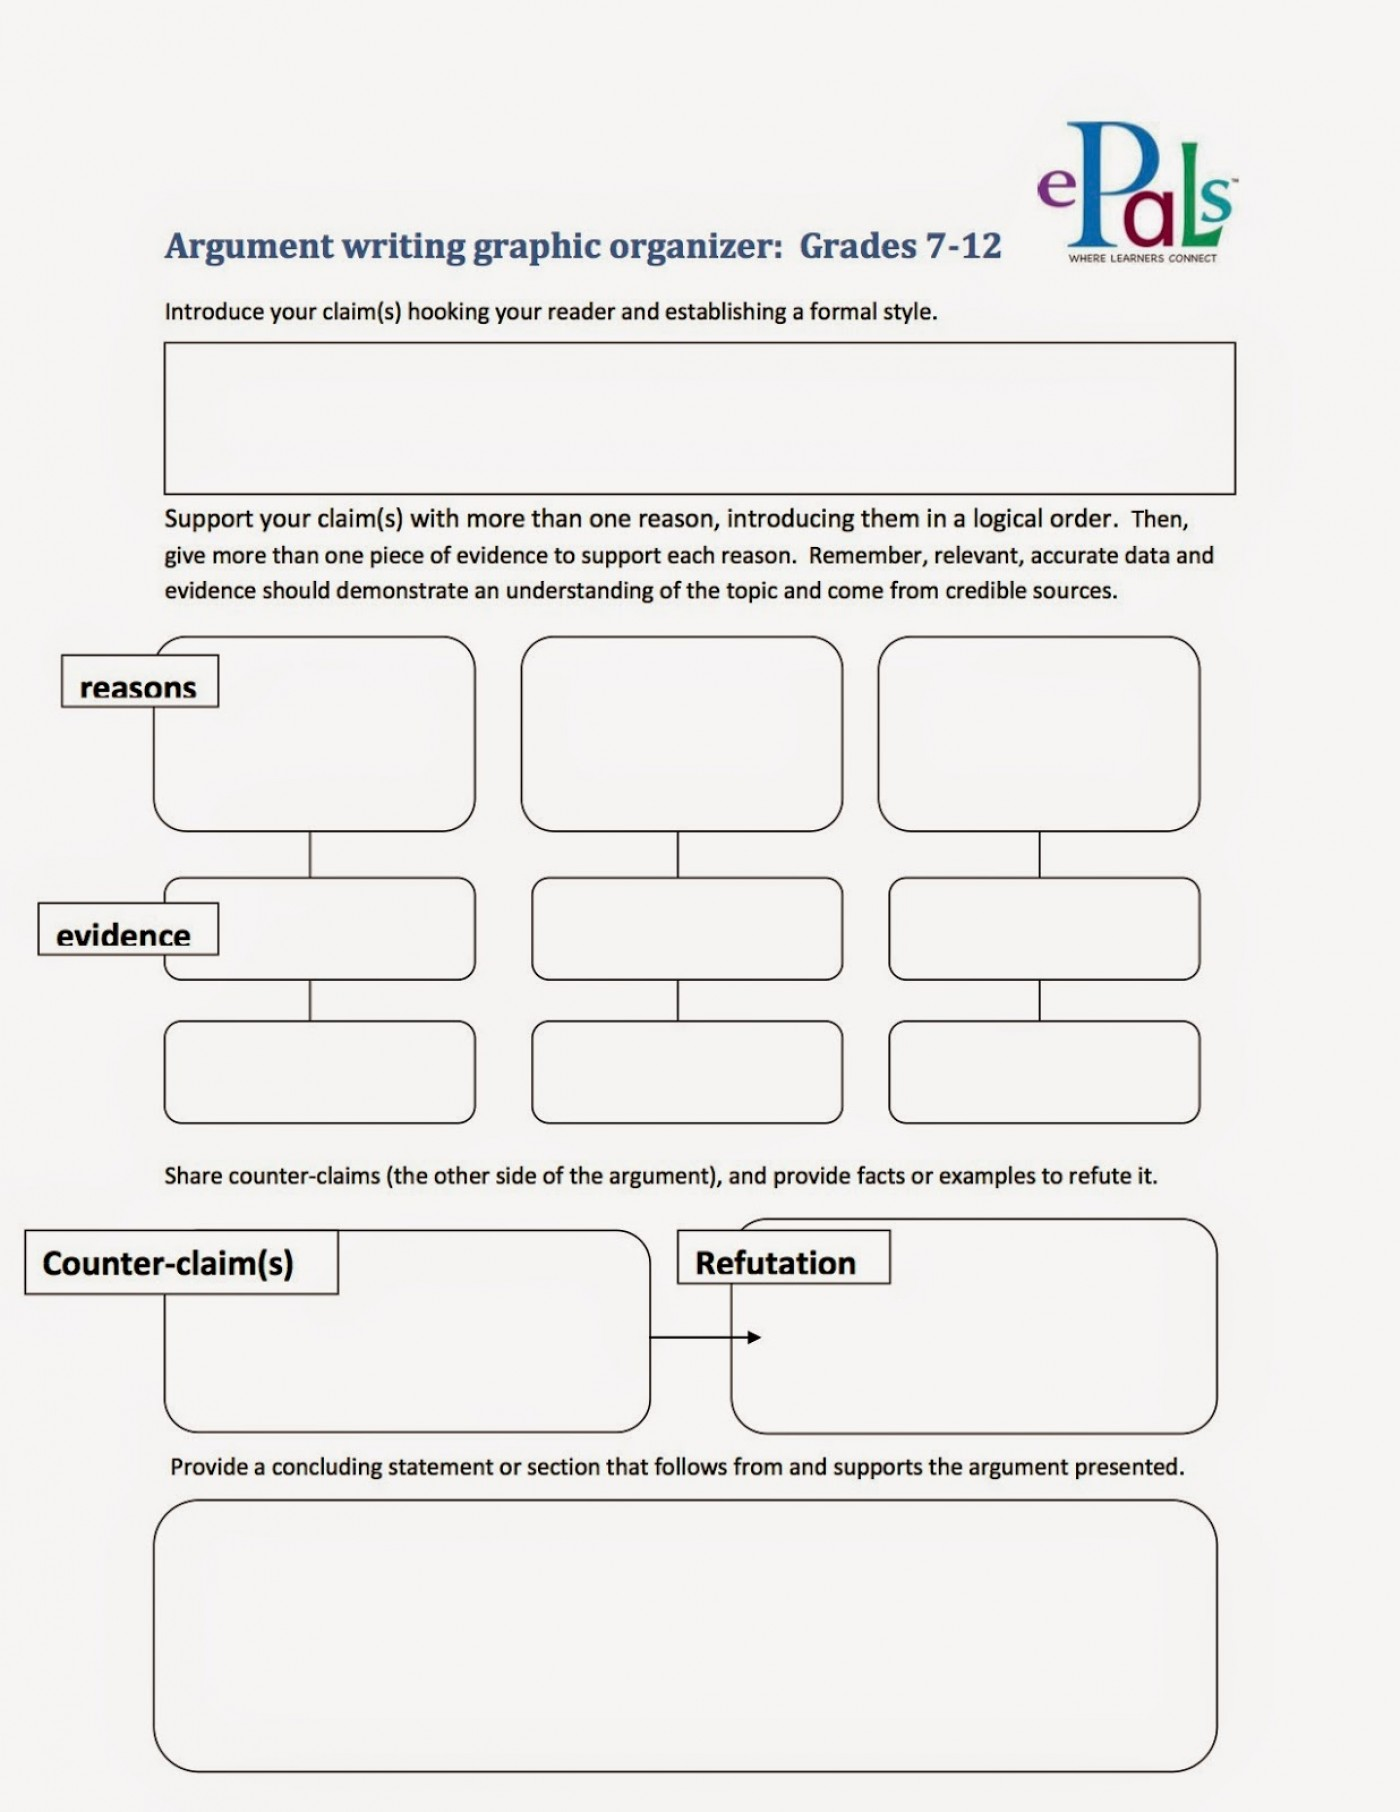 005 Argumentgraphicorganizer2bcopy Argument Essay Graphic Organizer Breathtaking Persuasive Examples Middle School Argumentative Pdf 1400